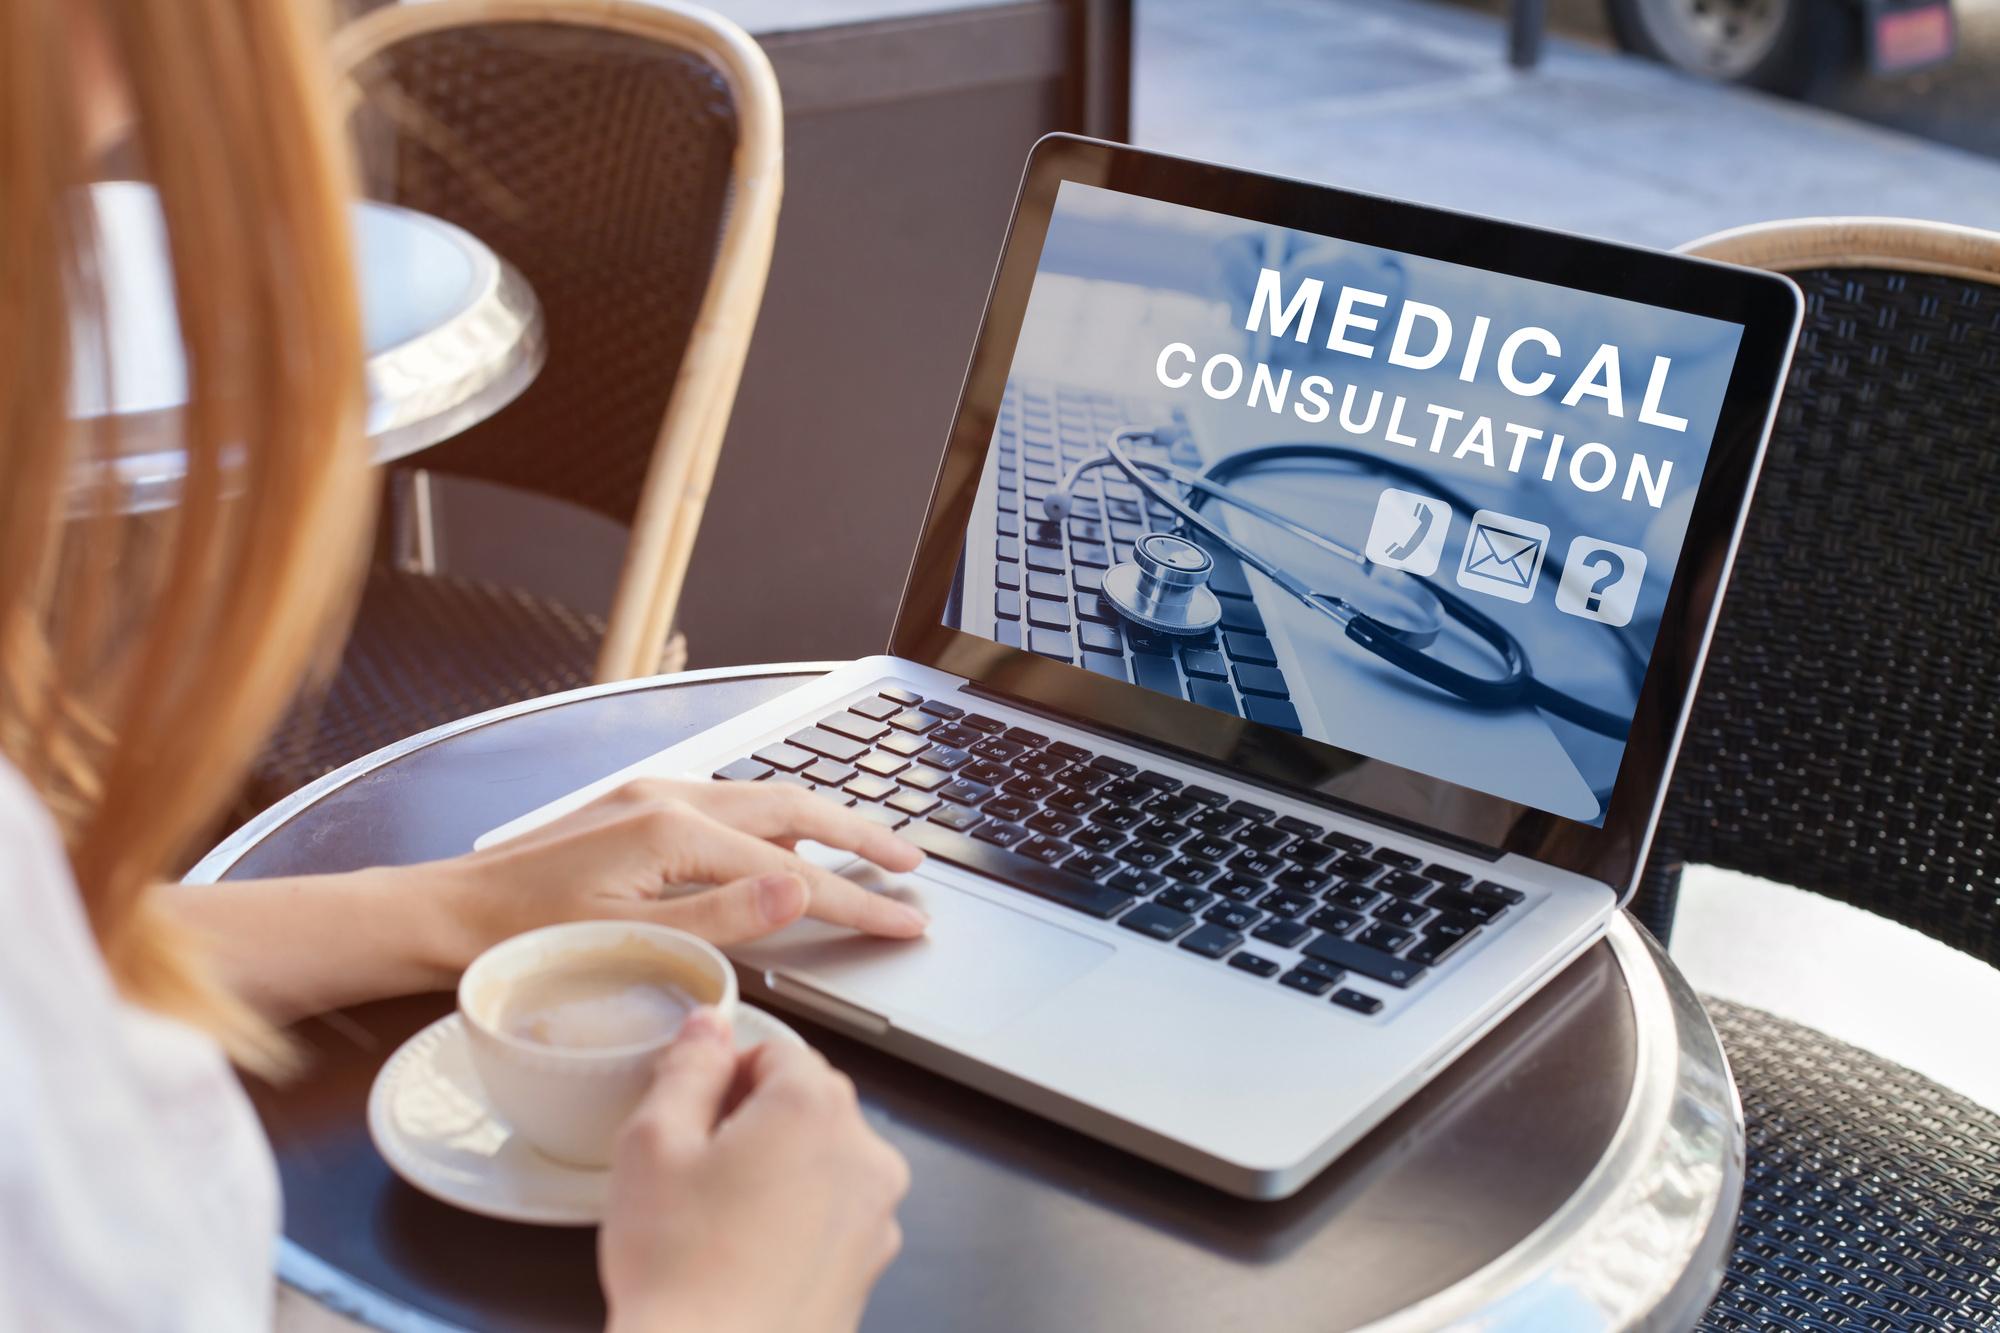 medical center logos